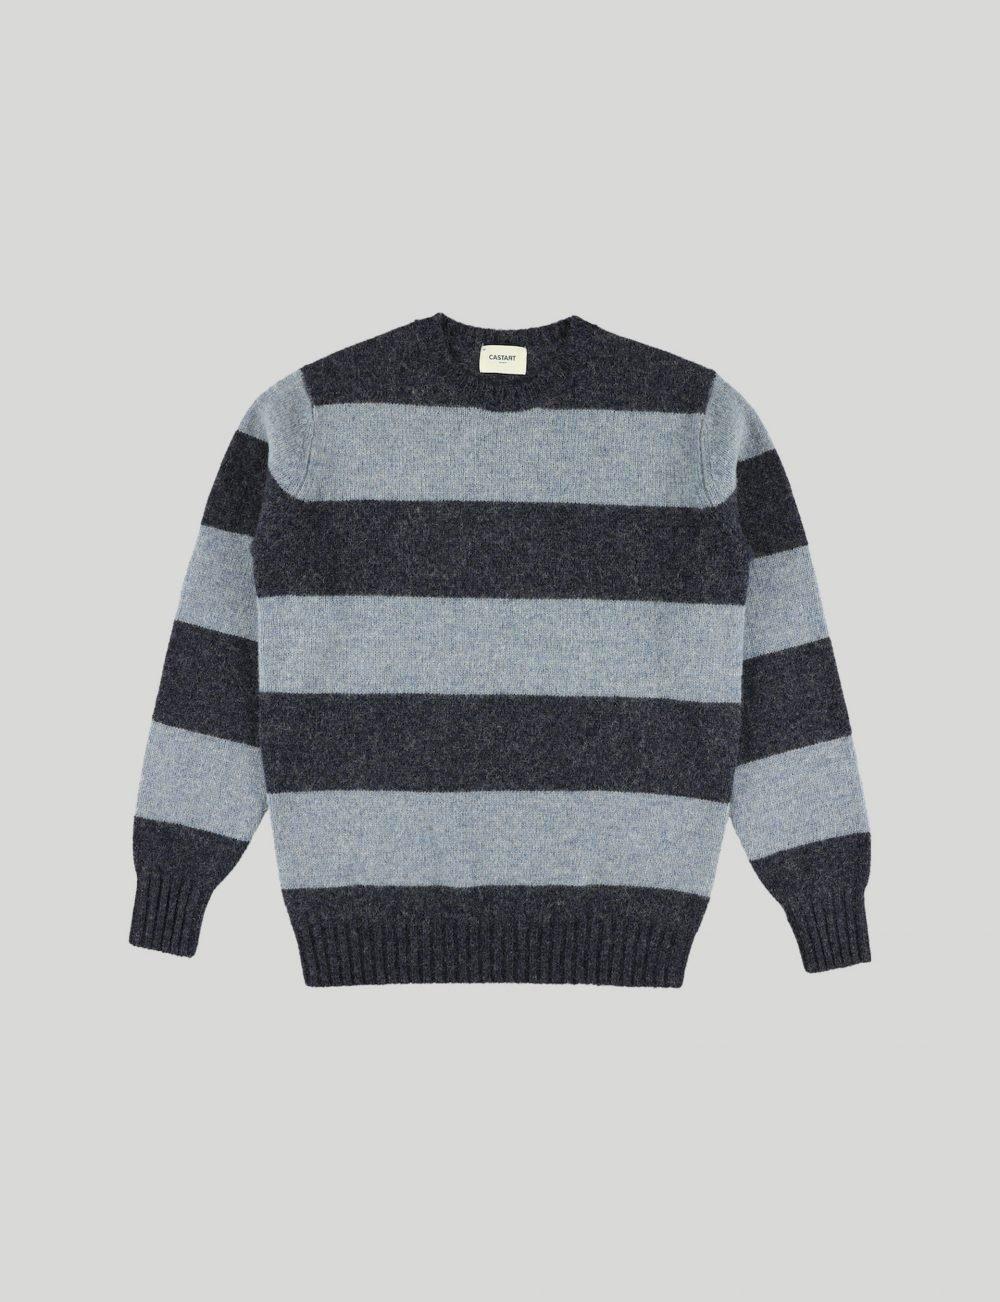 Castart - Poppelino Knitwear - Light Blue